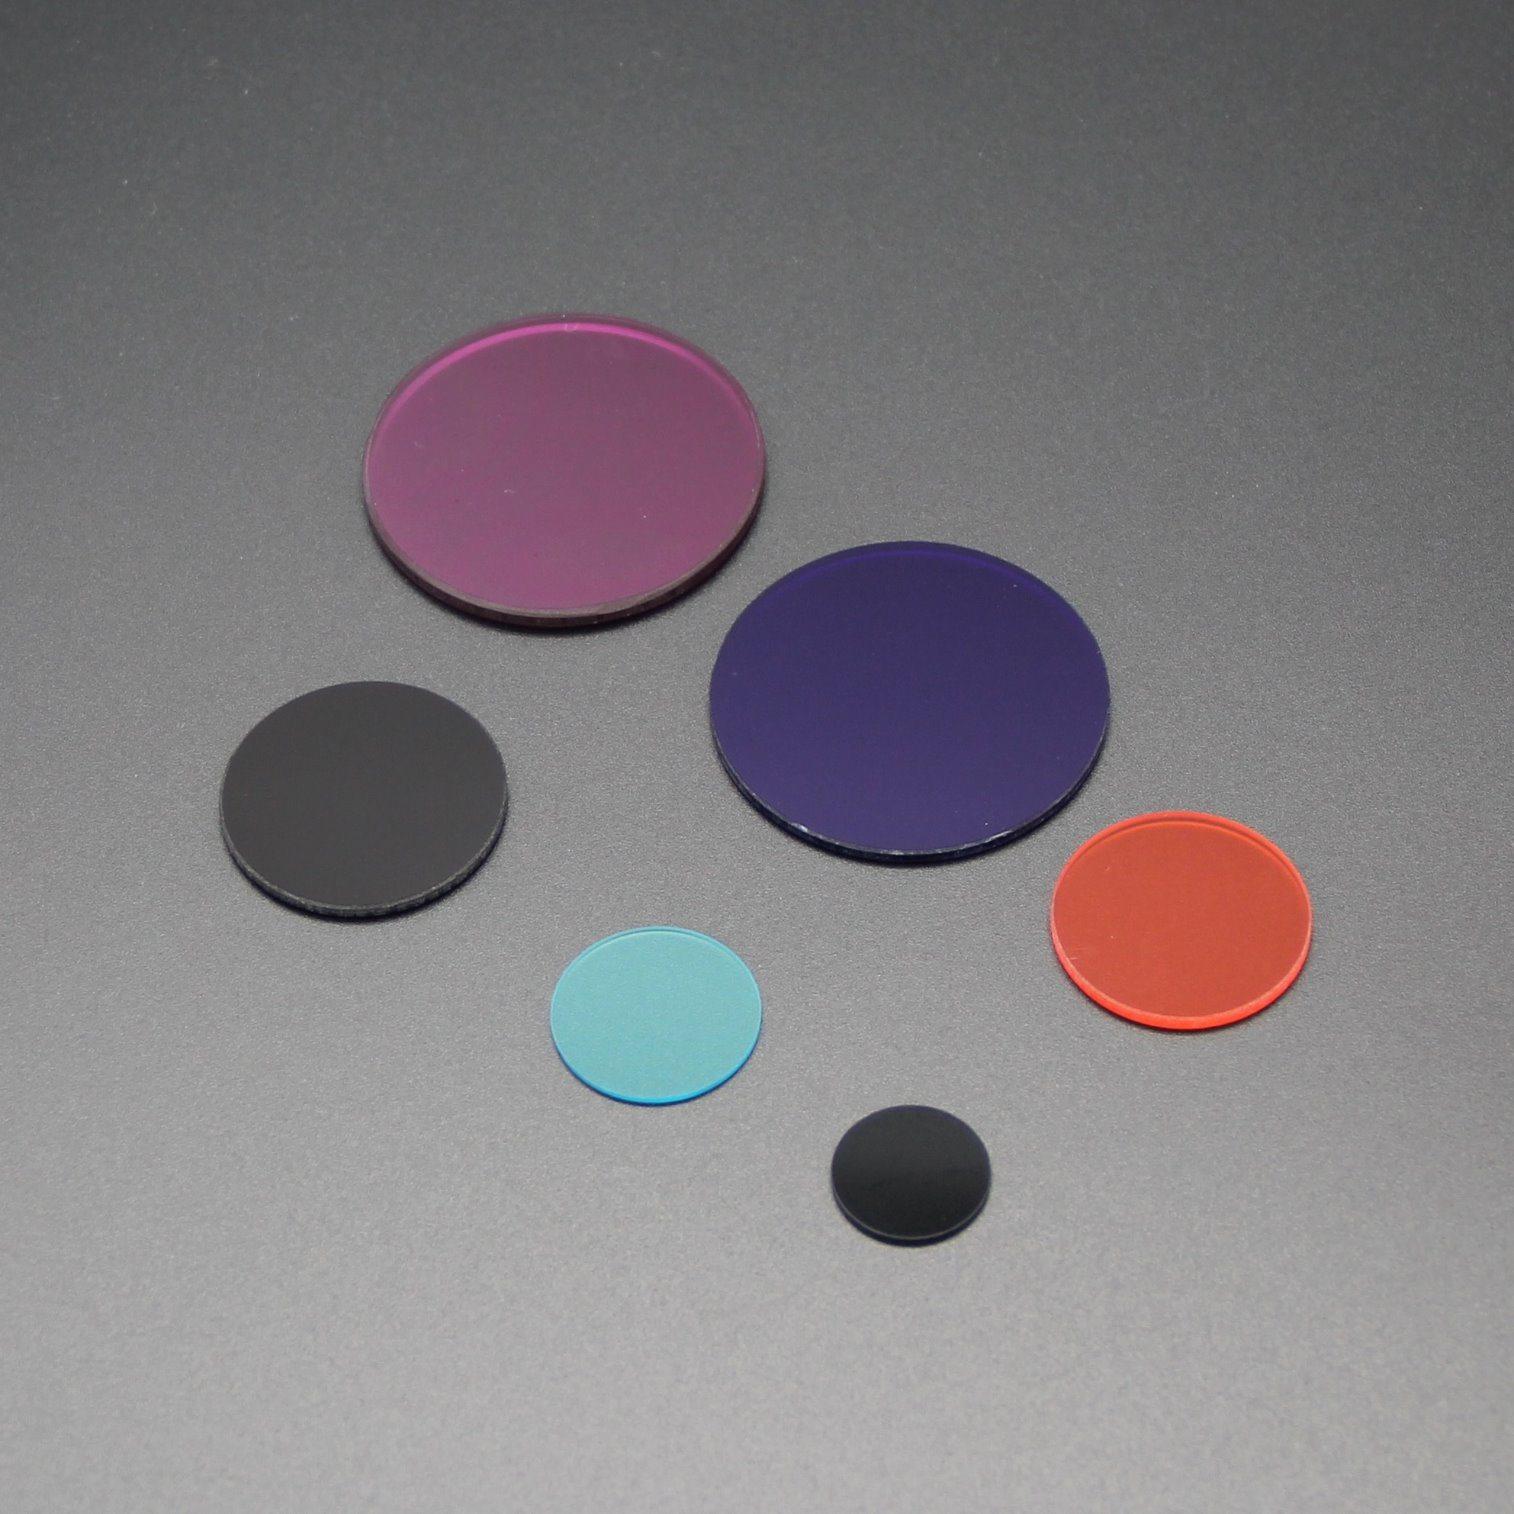 Band Pass Filter, Long Wavelength Pass Filter, Short Wavelength Pass Filter, Band Blocking Filter